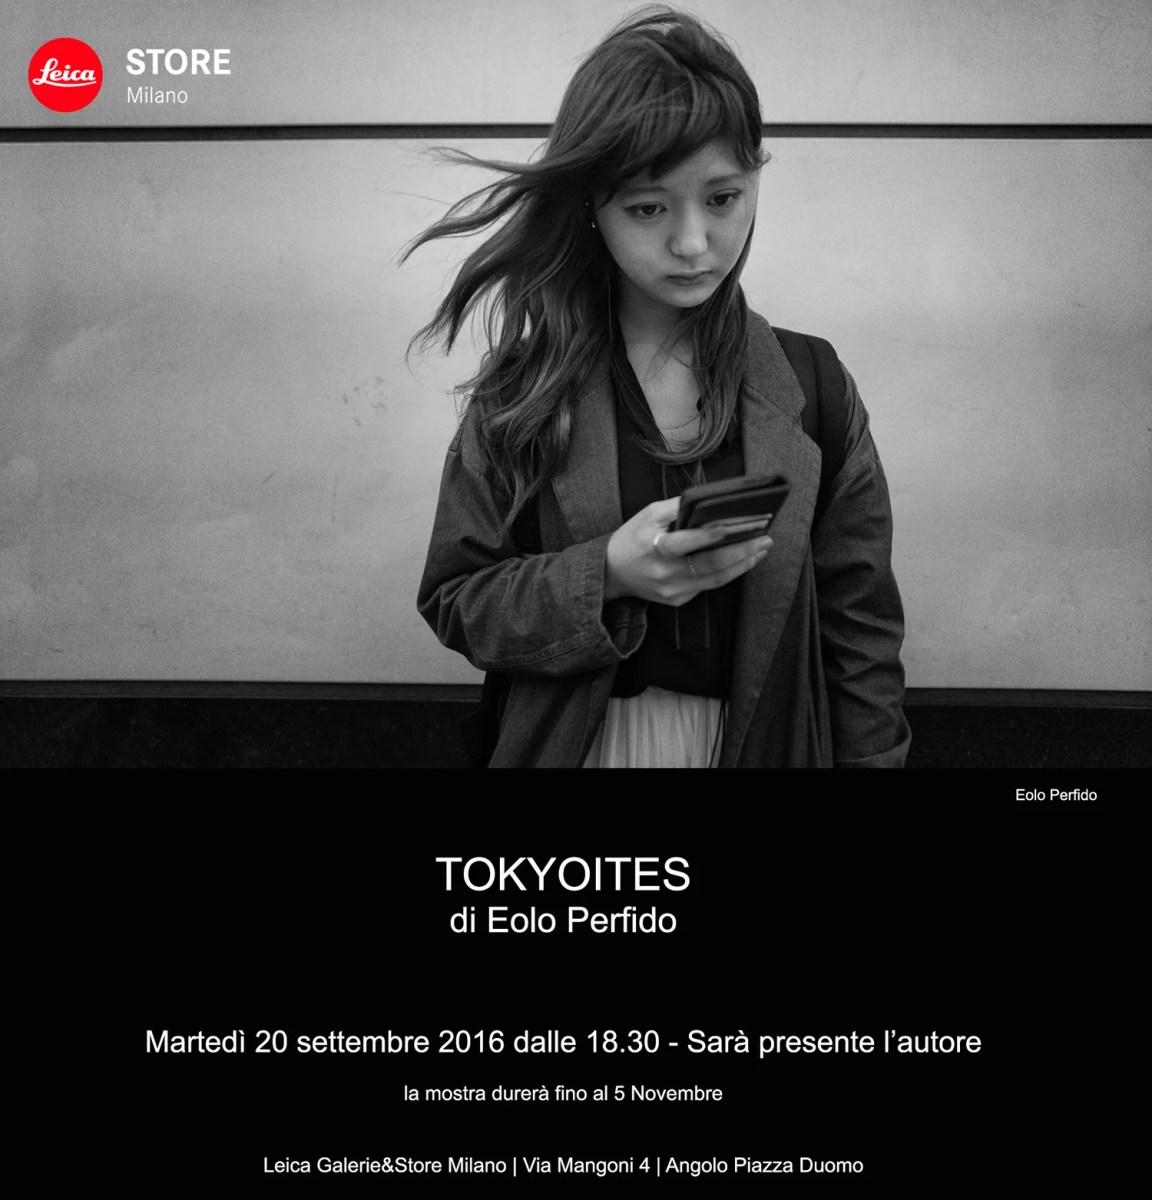 TOKYOITES E L'UMANITA' DI EOLO PERFIDO